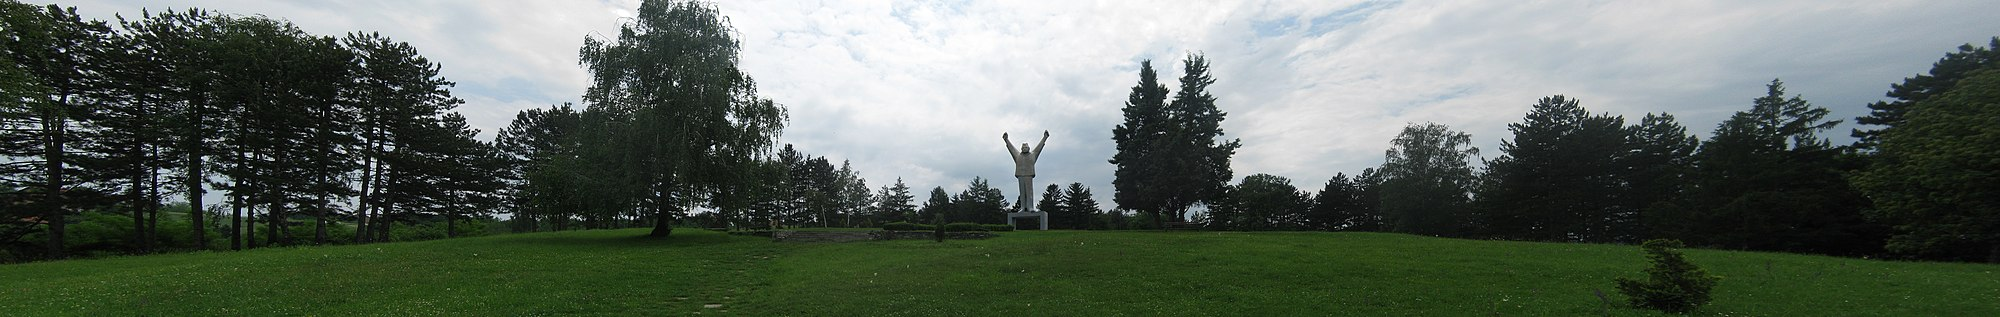 Spomenici Narodnooslobodilacke Borbe Wikiwand